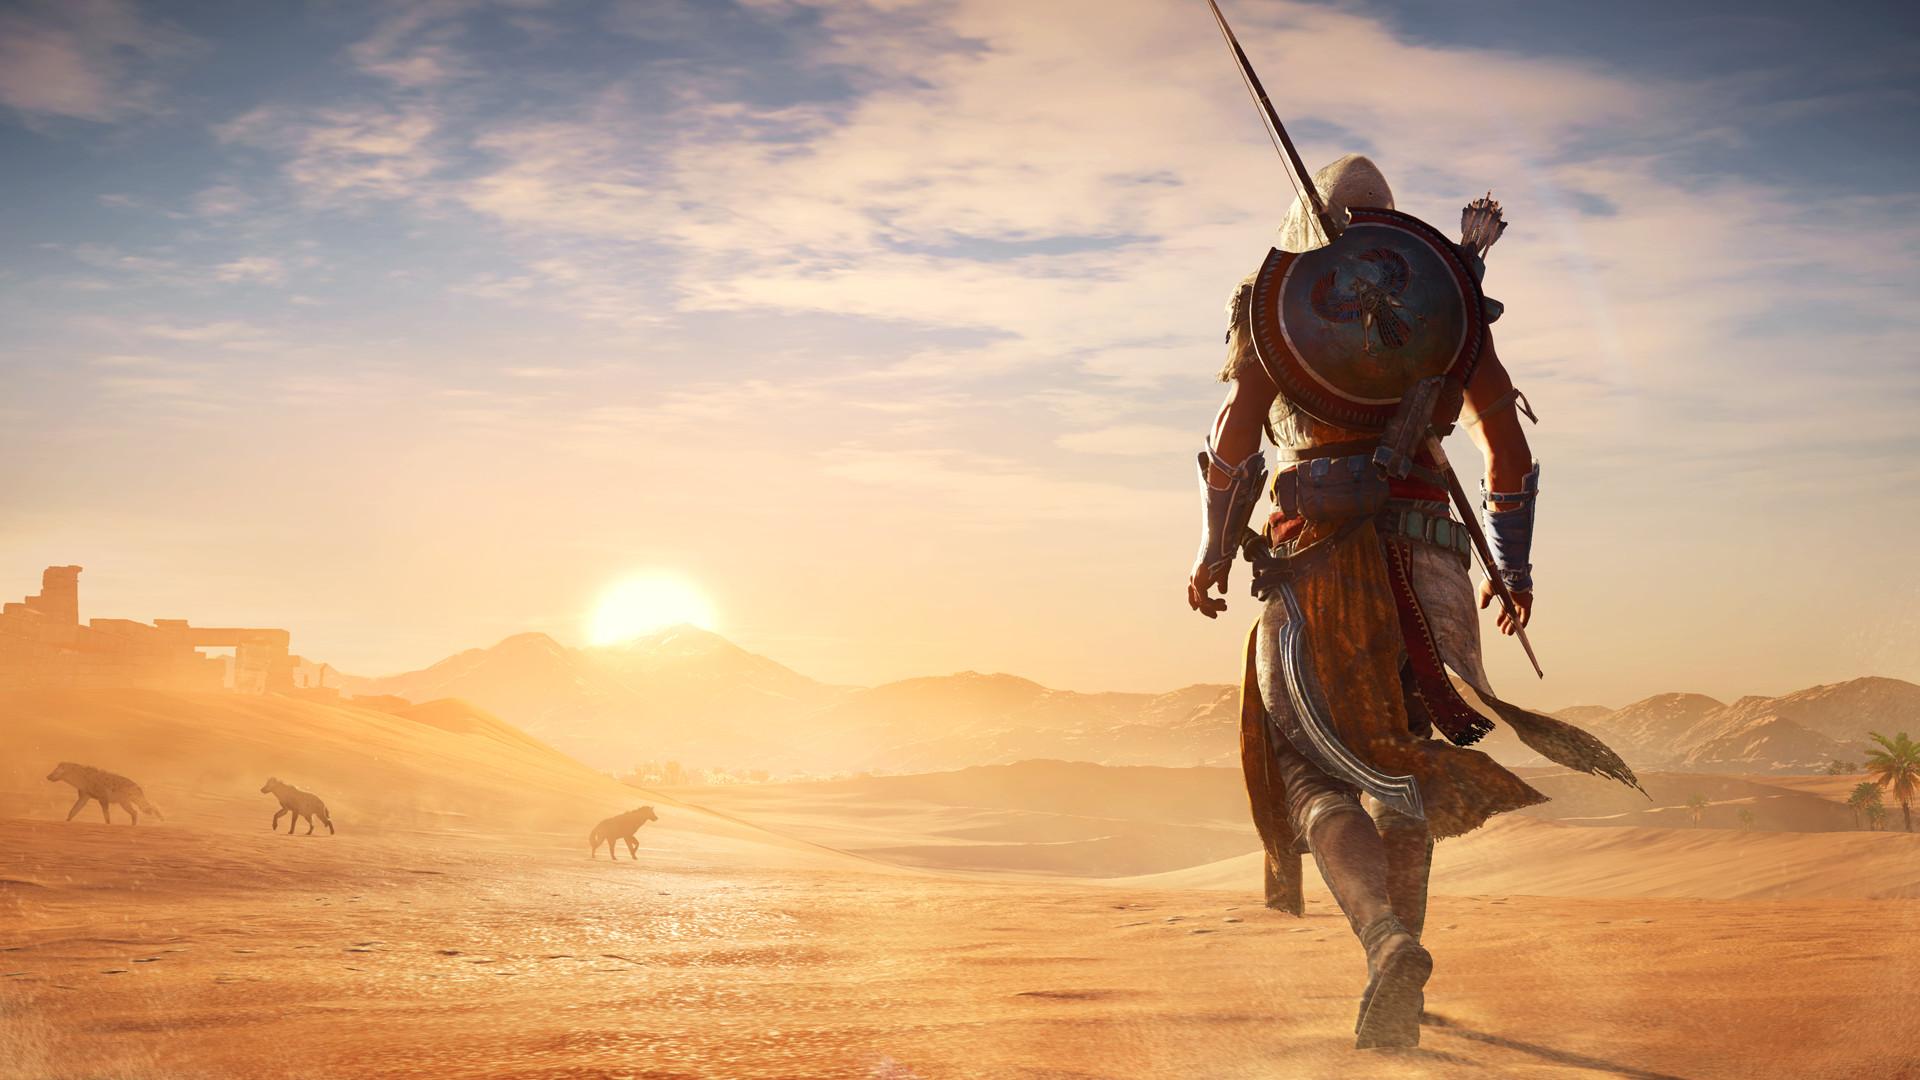 [PC] Про игру Assassin's Creed: Origins. - Изображение 1